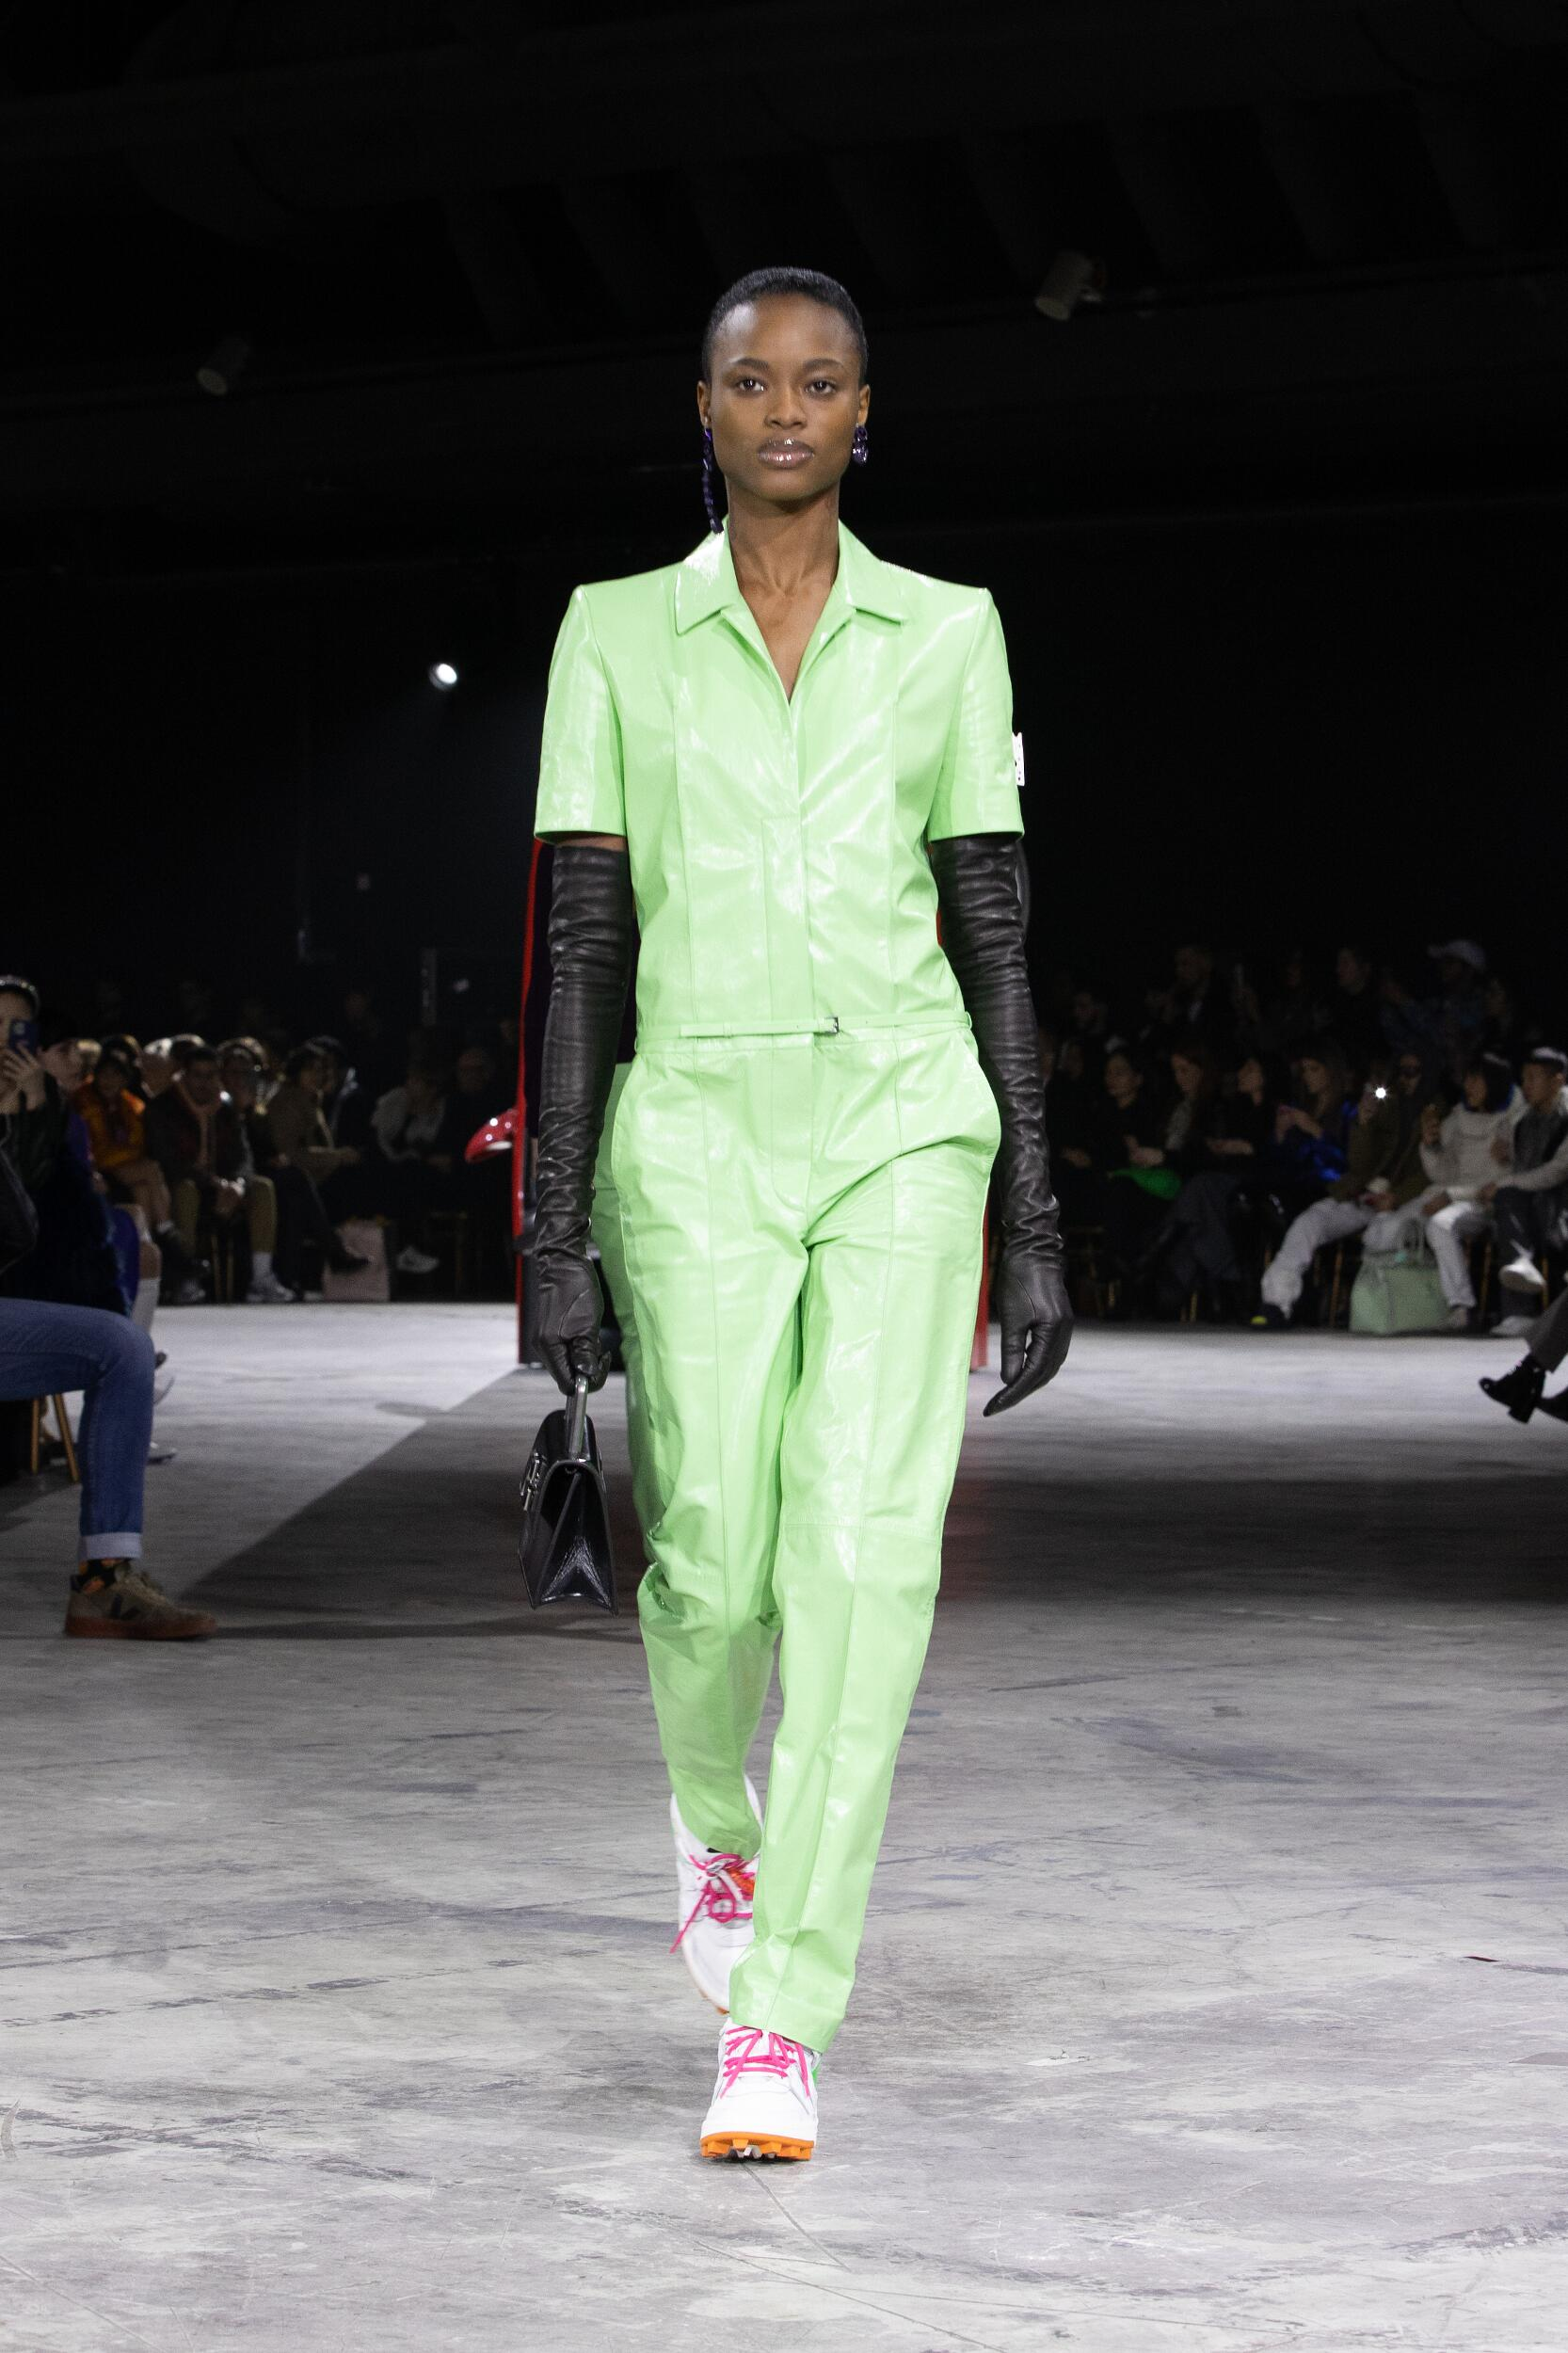 Catwalk Off White c/o Virgil Abloh Woman Fashion Show Winter 2020